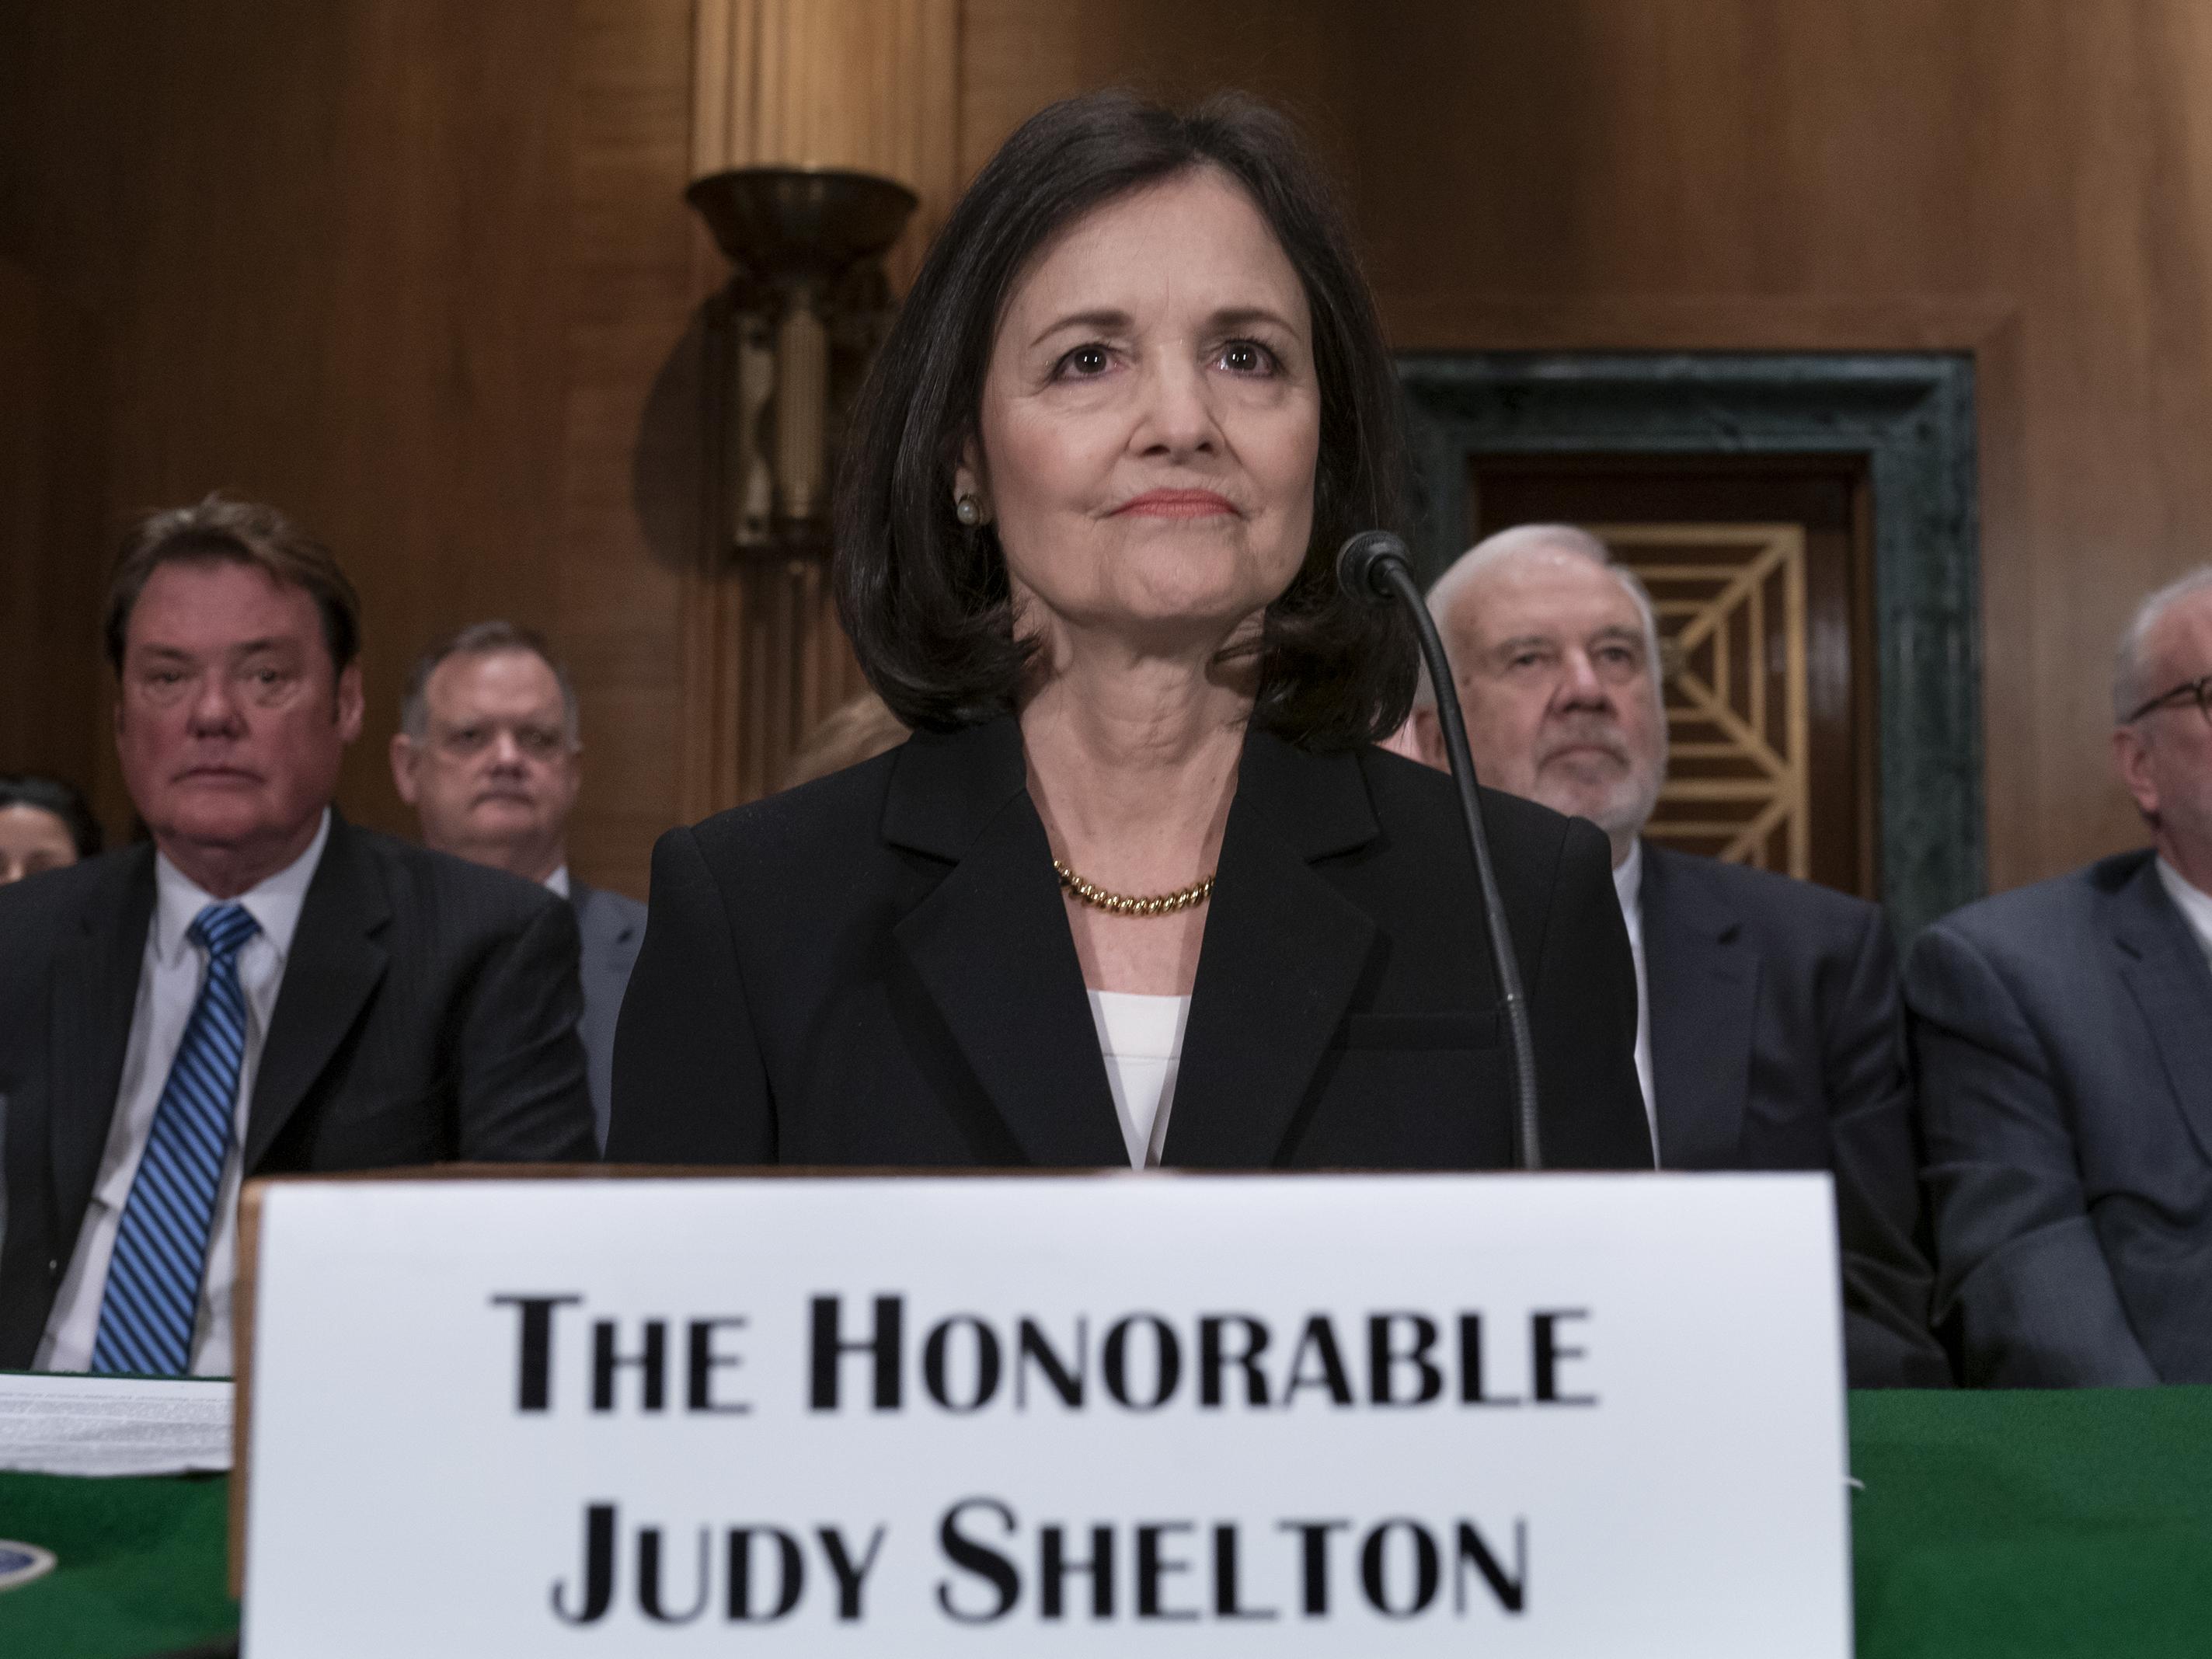 Trump's Fed nominee Judy Shelton hits roadblock in Senate vote